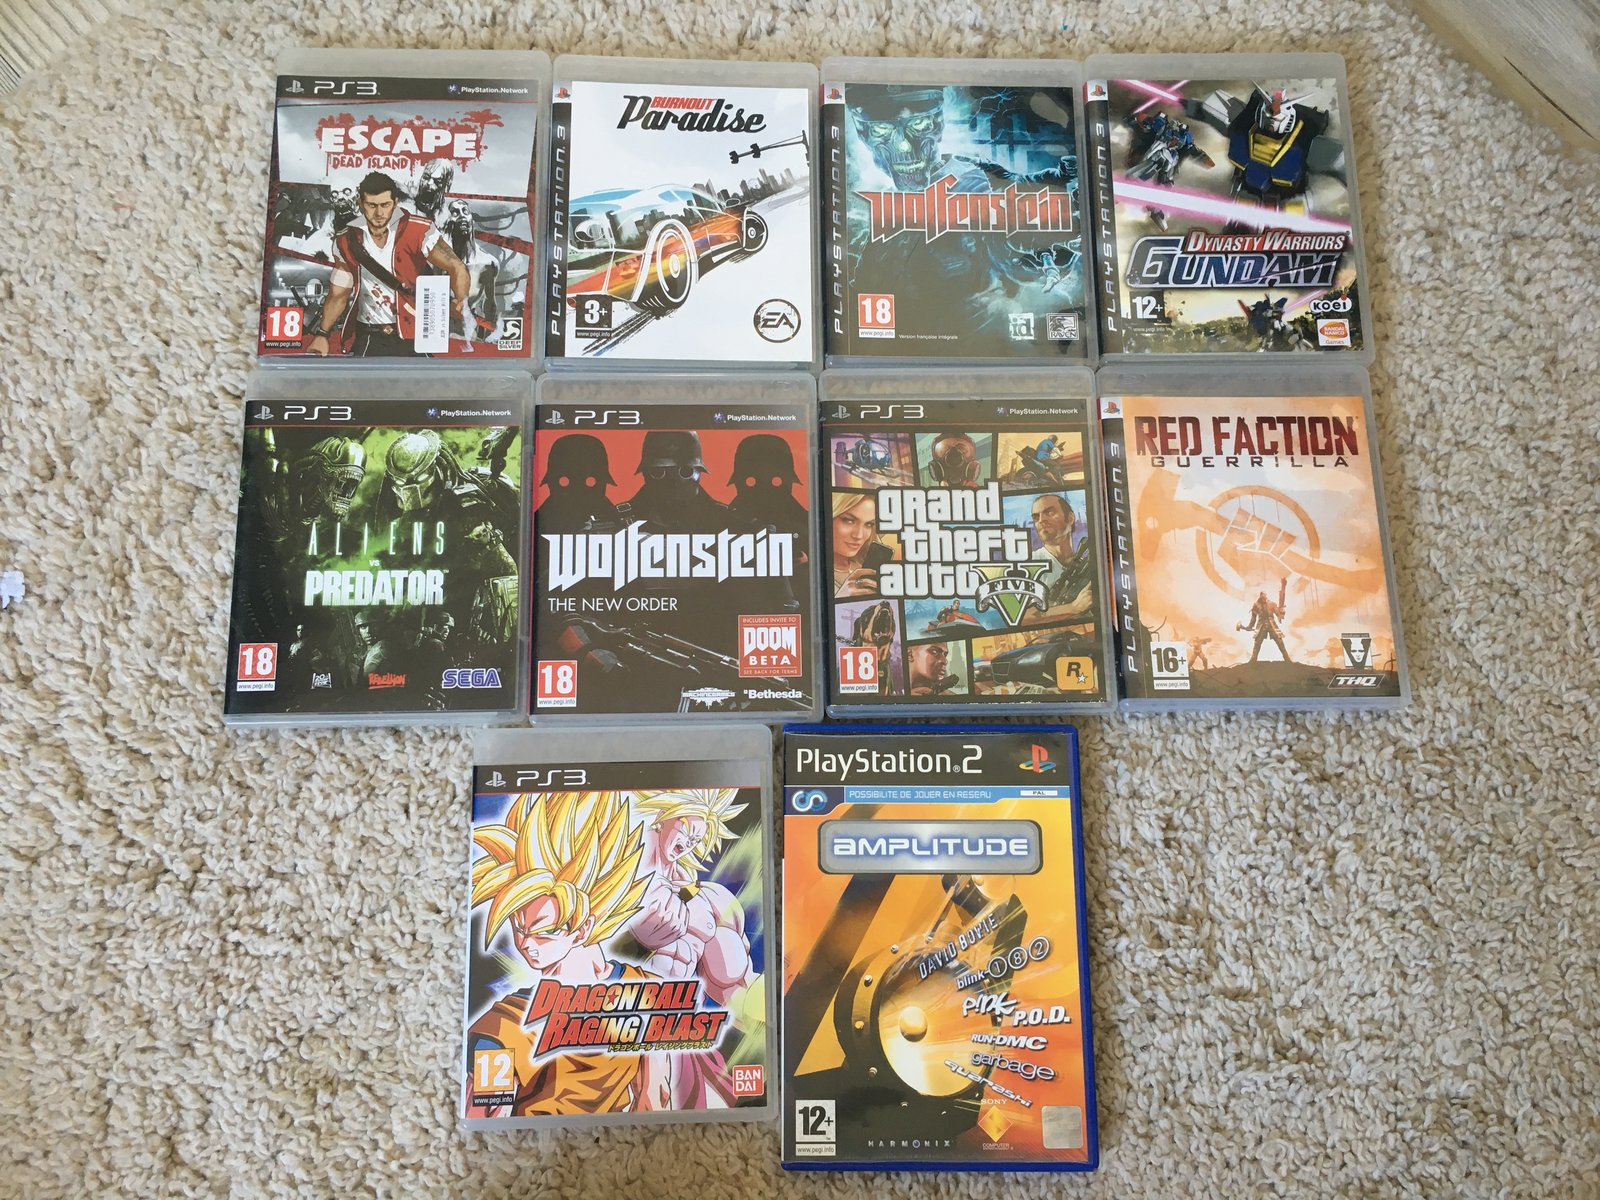 [VDS] Jeux PS3, PS2, Naruto Boruto collector PS4, VITA, matos PSOne MAJ 24/06/2020 200624101937219608